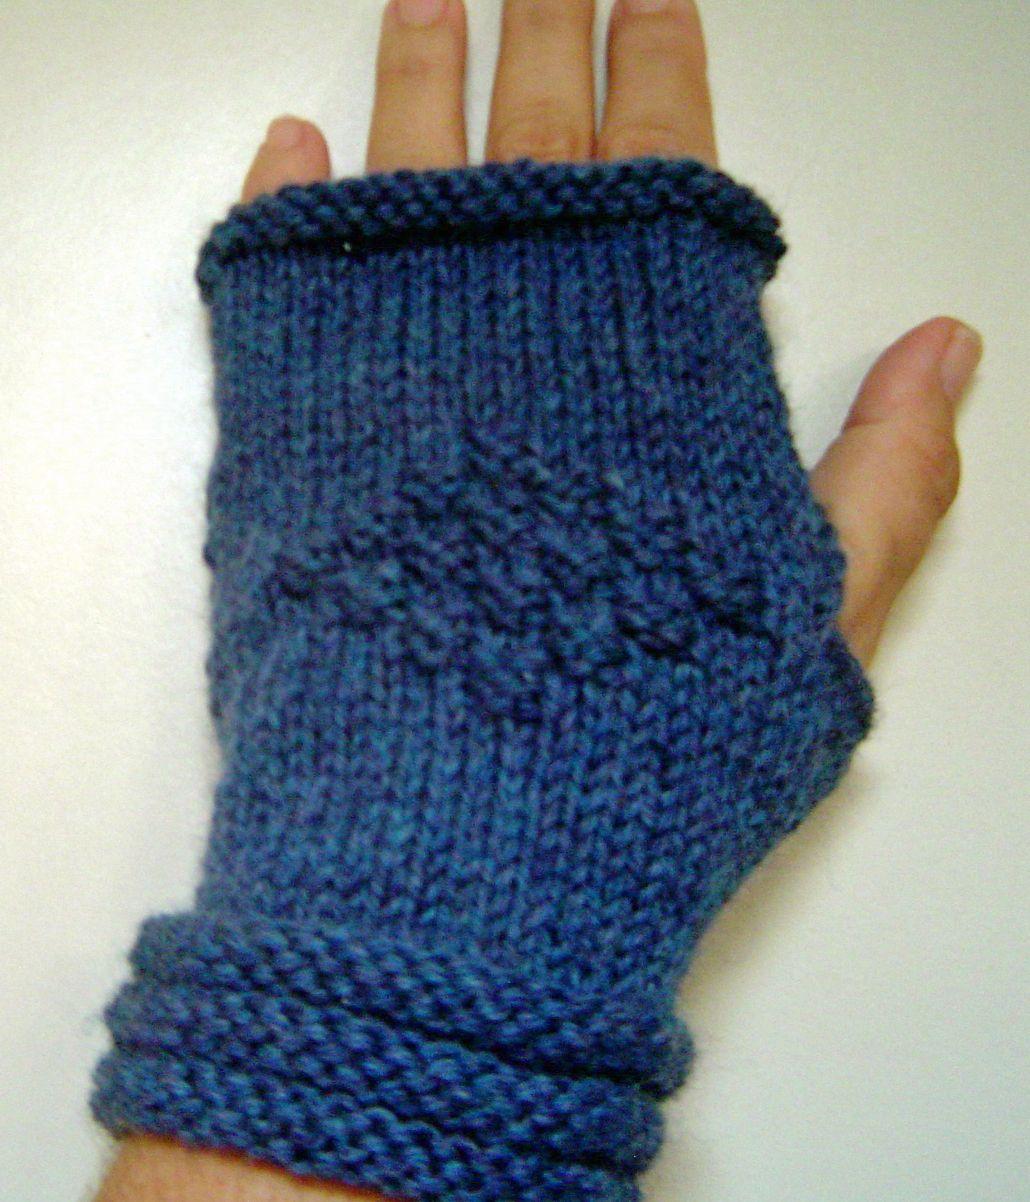 SUPER EASY WRIST WARMERS | Knitted wrist warmer, Wrist ...